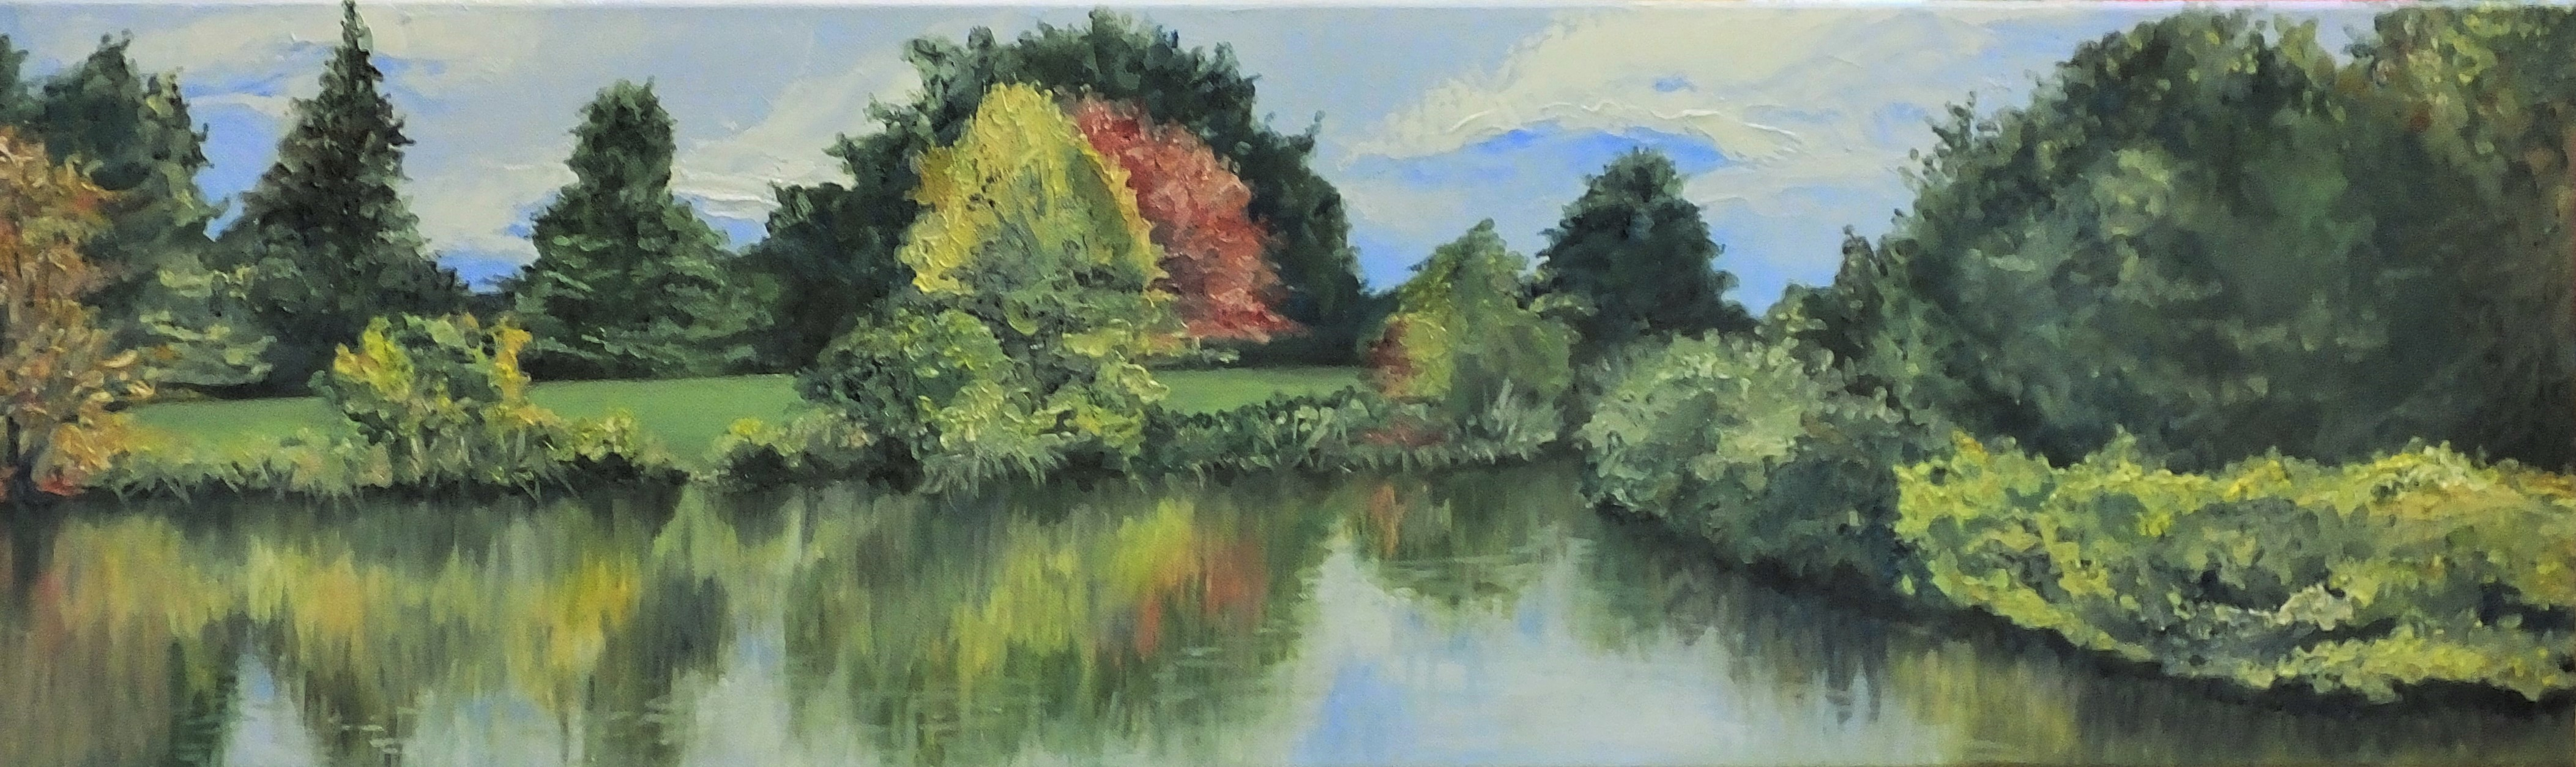 Warwick Lakes